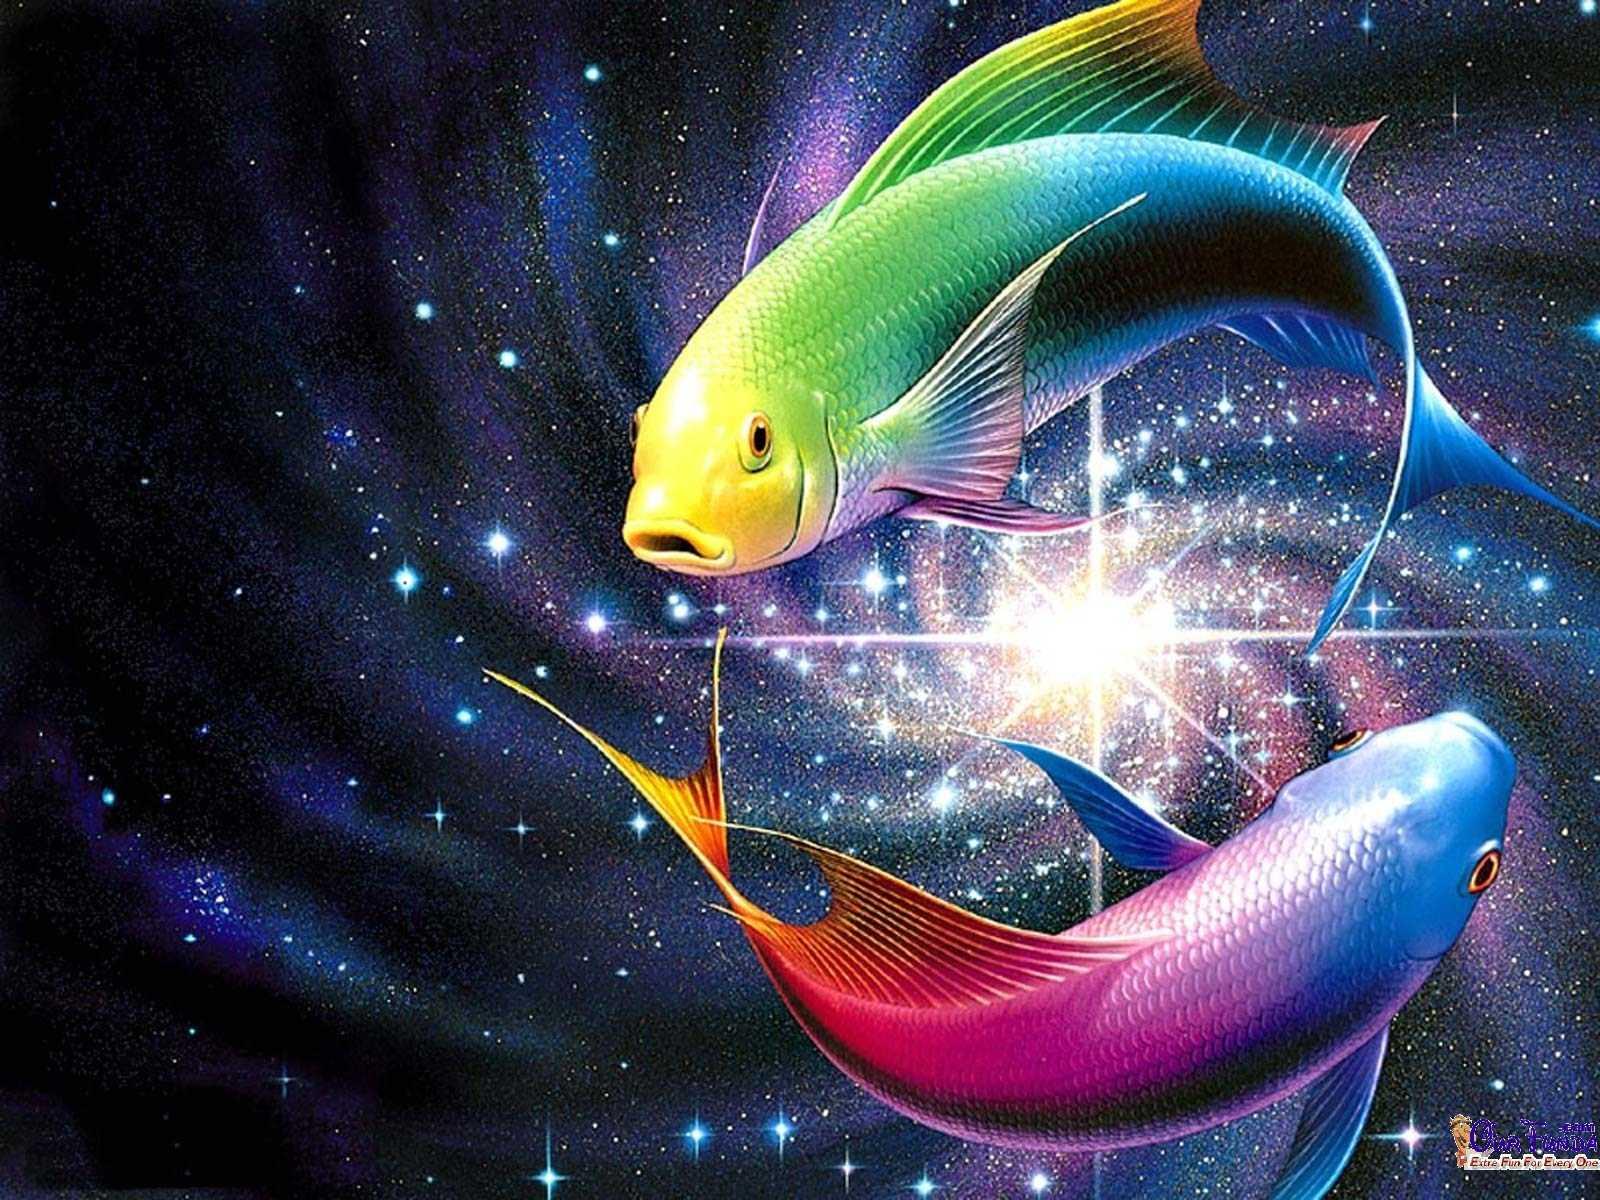 Free-Slanting-Fish-HD-wallpaper-wpc5805138